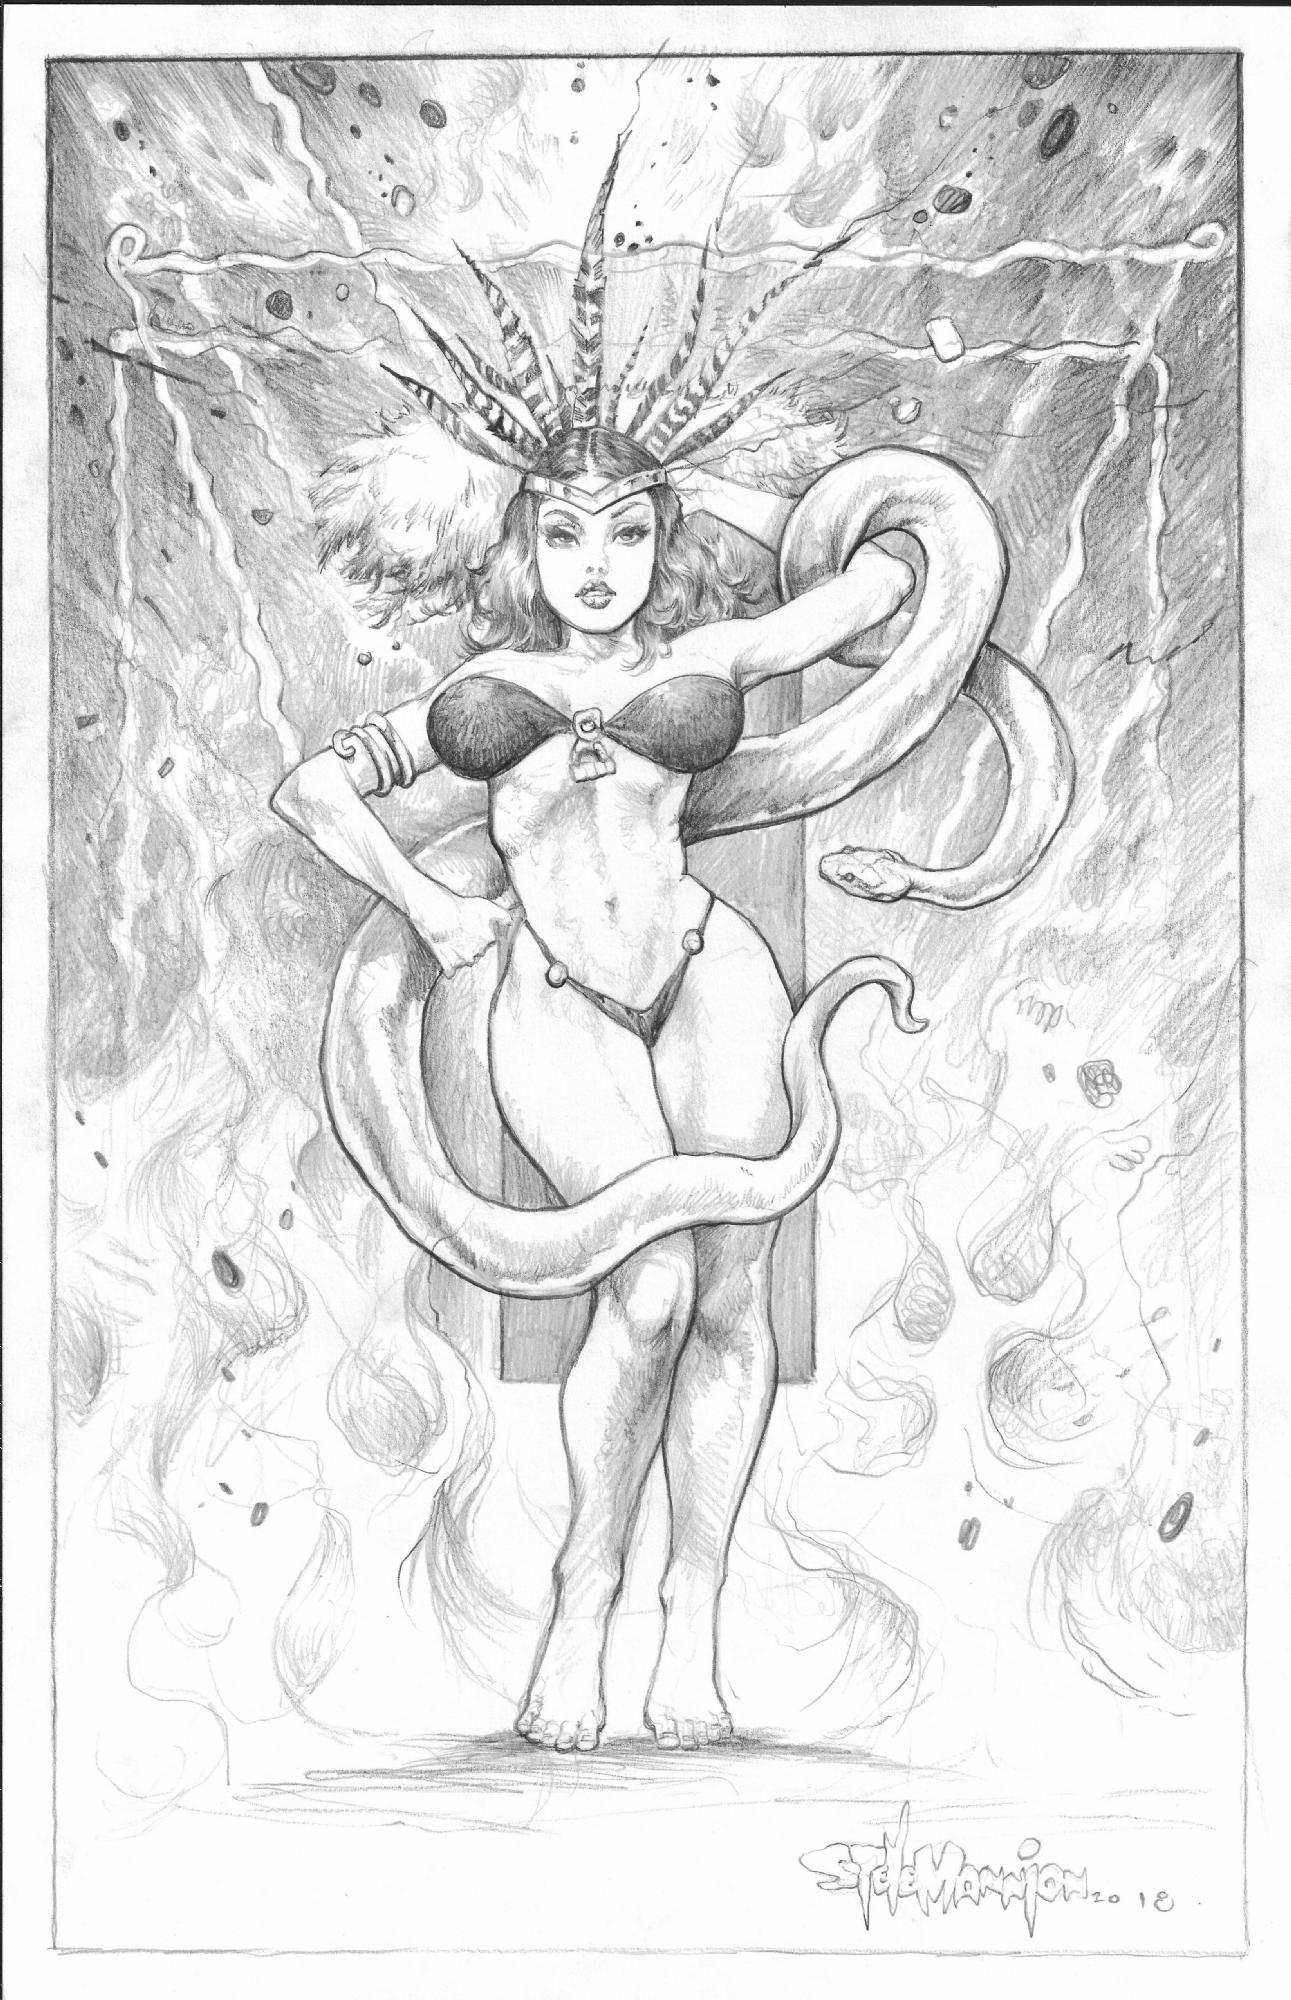 Steve Mannion Santanico Pandemonium From Dusk Til Dawn Version 1 In Michael Diaz S Commissions Pin Ups Con Sketches Comic Art Gallery Room